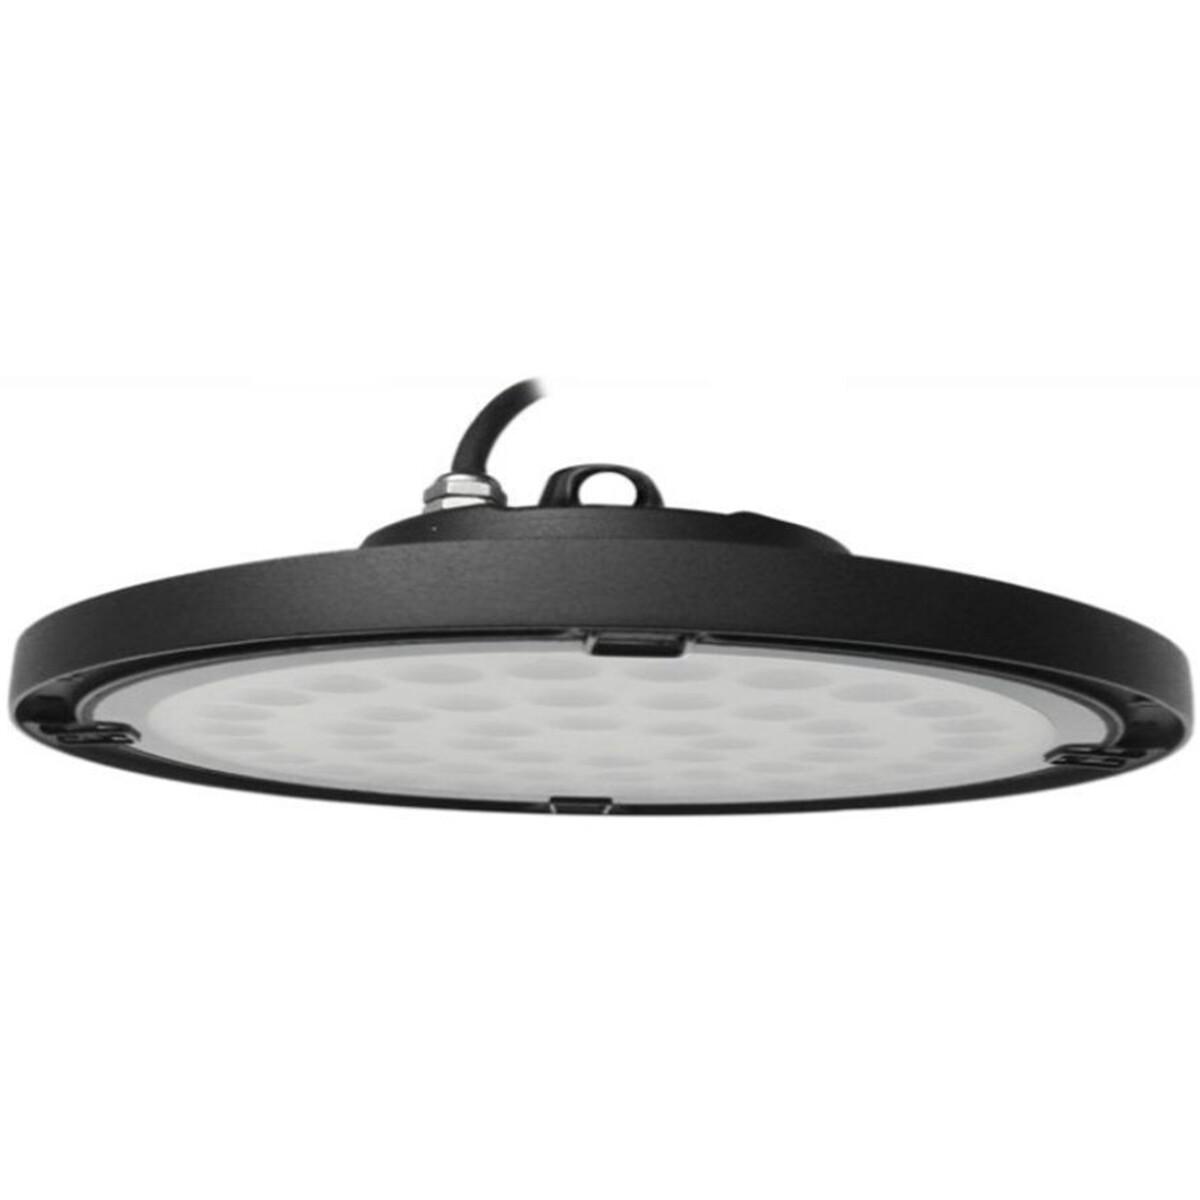 OSRAM - LED UFO High Bay 100W - Magazijnverlichting - Waterdicht IP65 - Natuurlijk Wit 4000K - Alumi